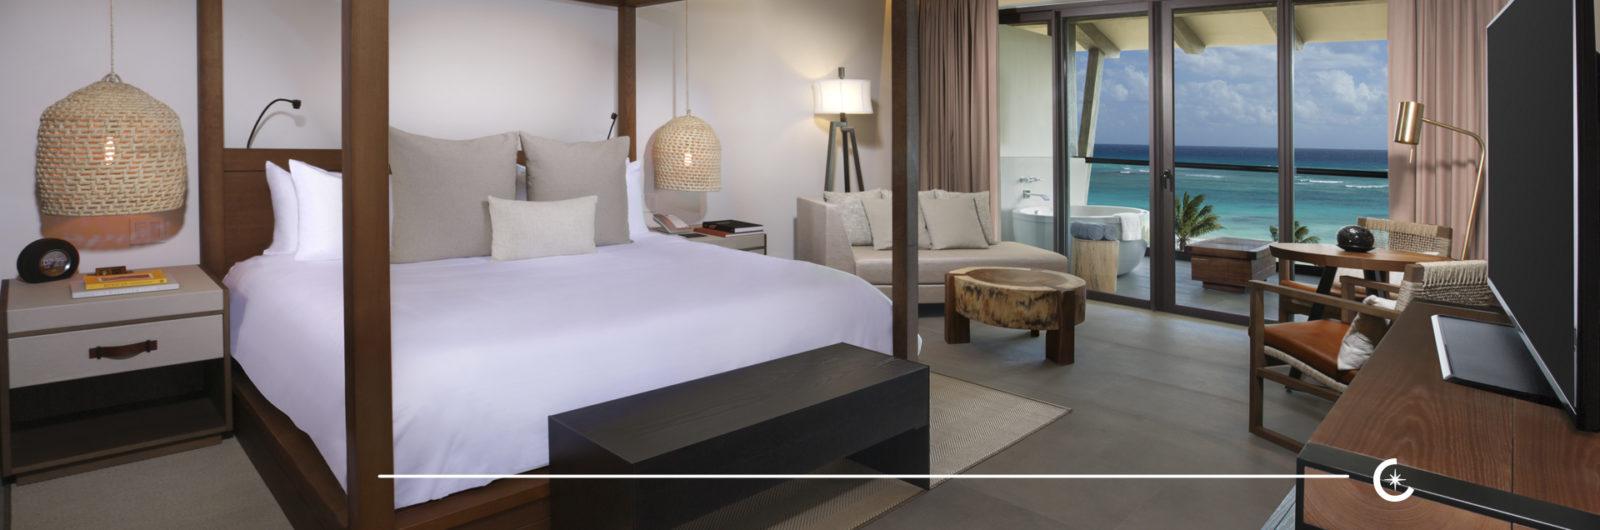 Mexico Resort 2021